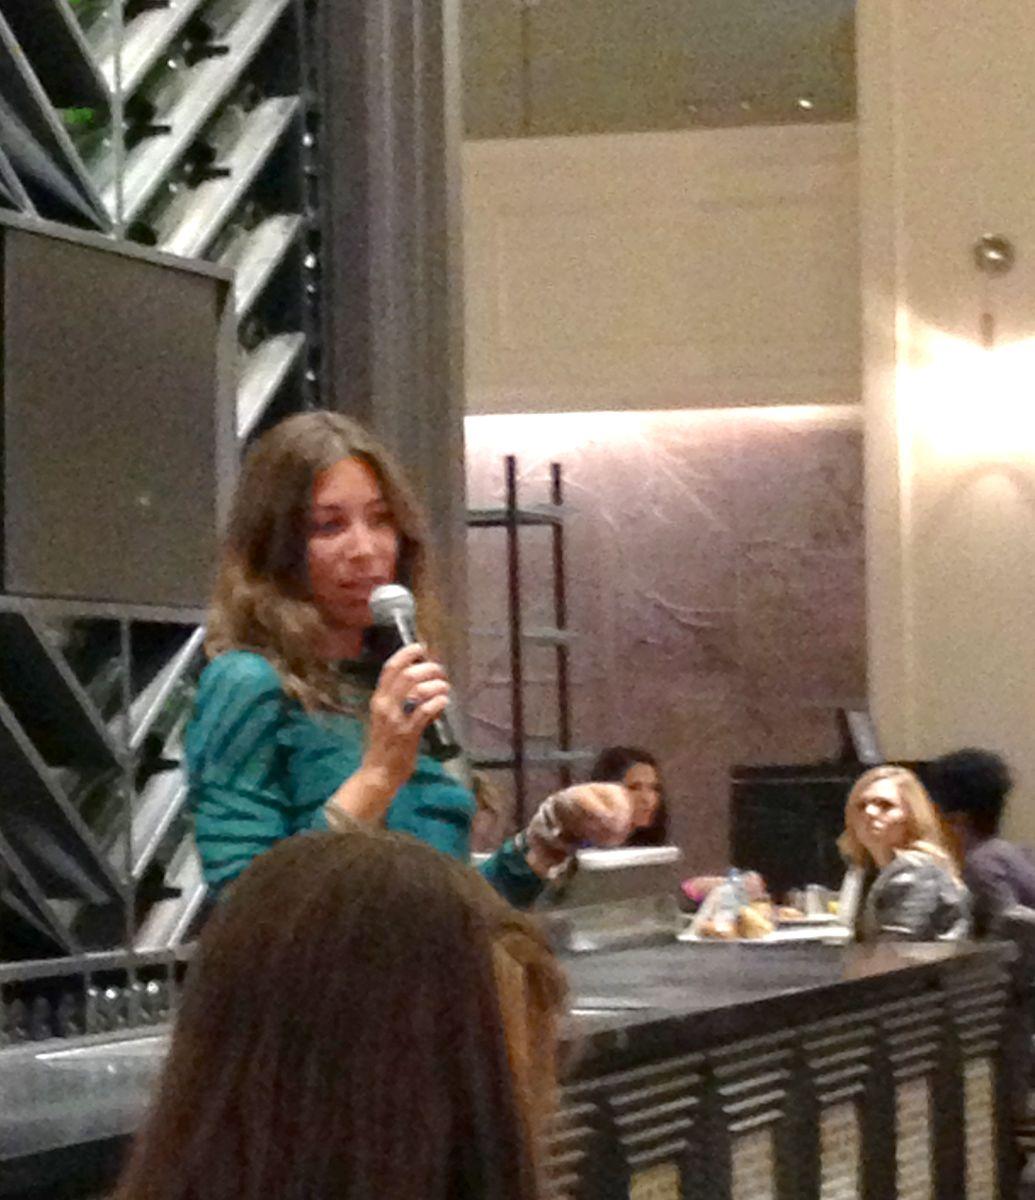 Elissa Kravetz, Kravetz PR, park central hotel, nyc